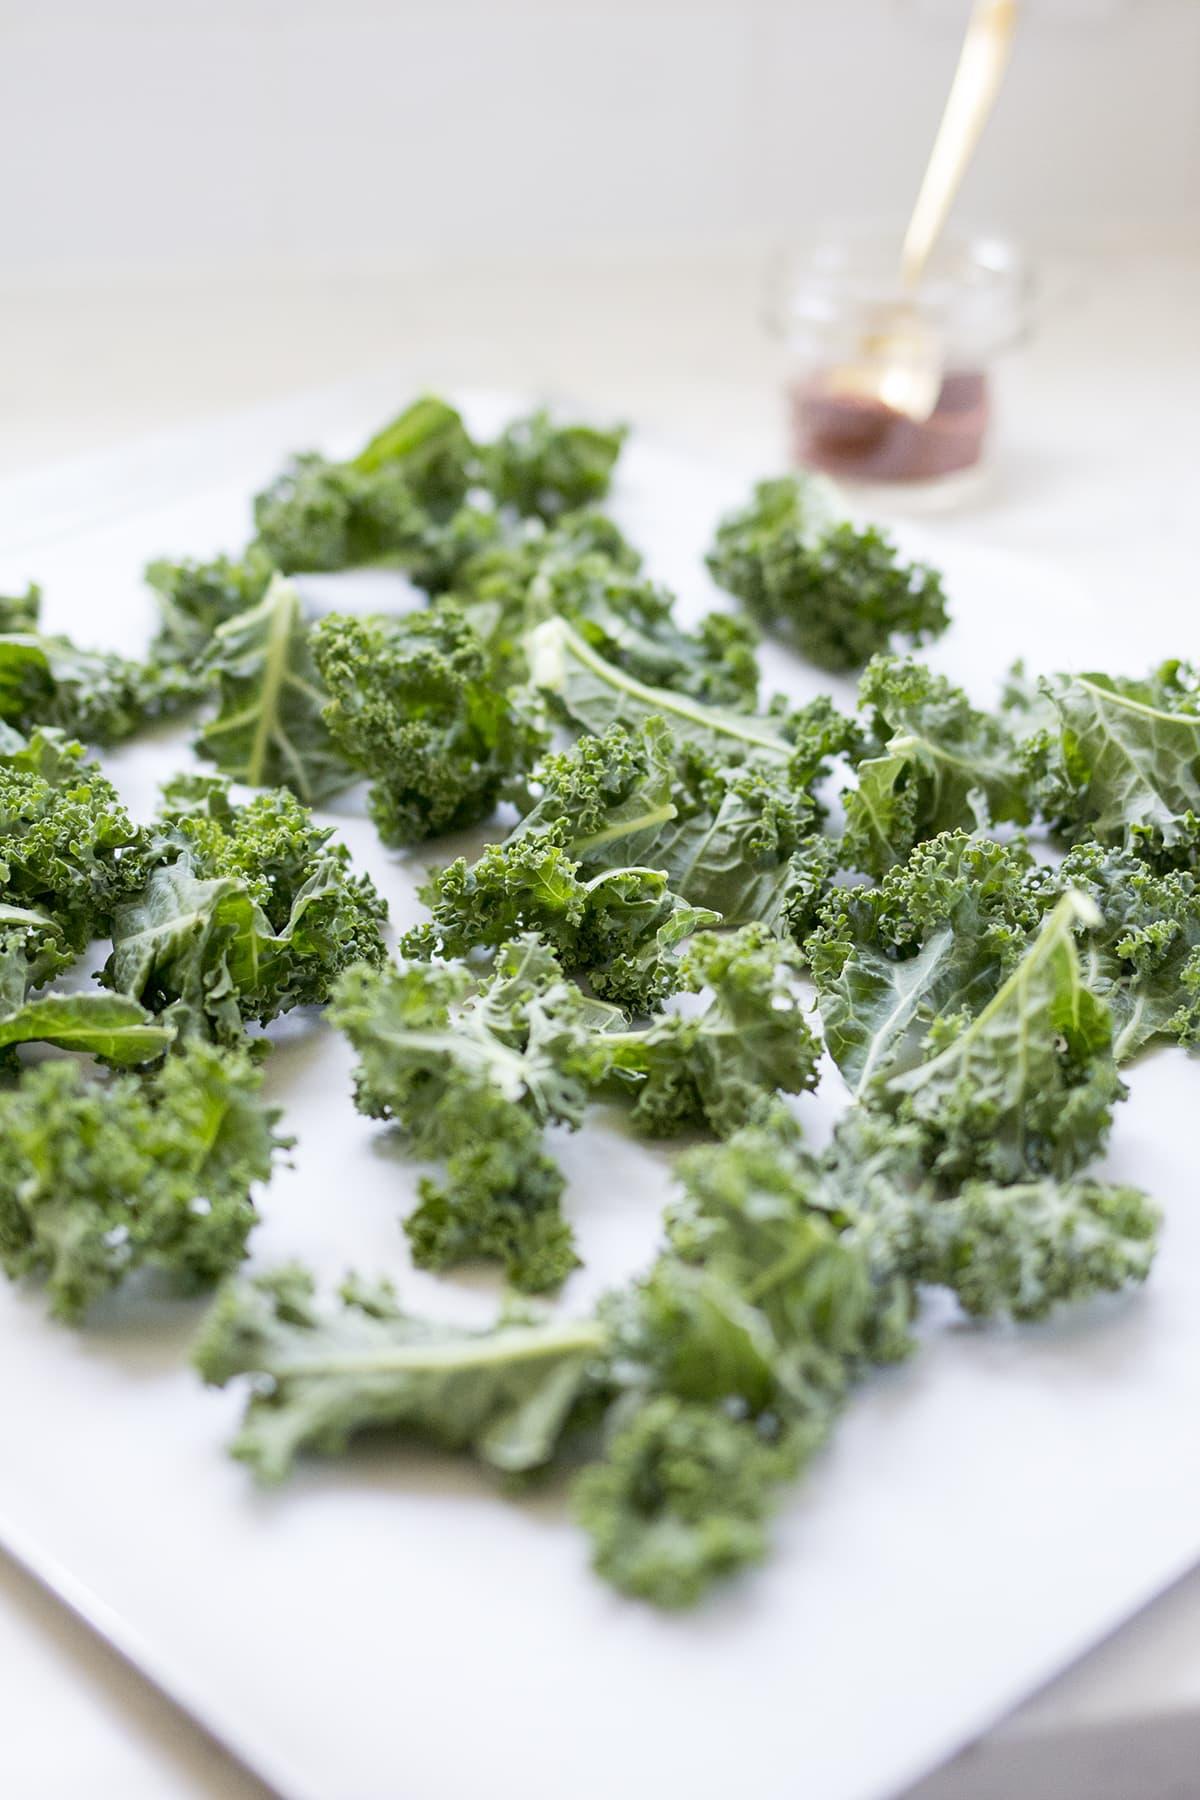 Crispy Barbecue Kale Chips